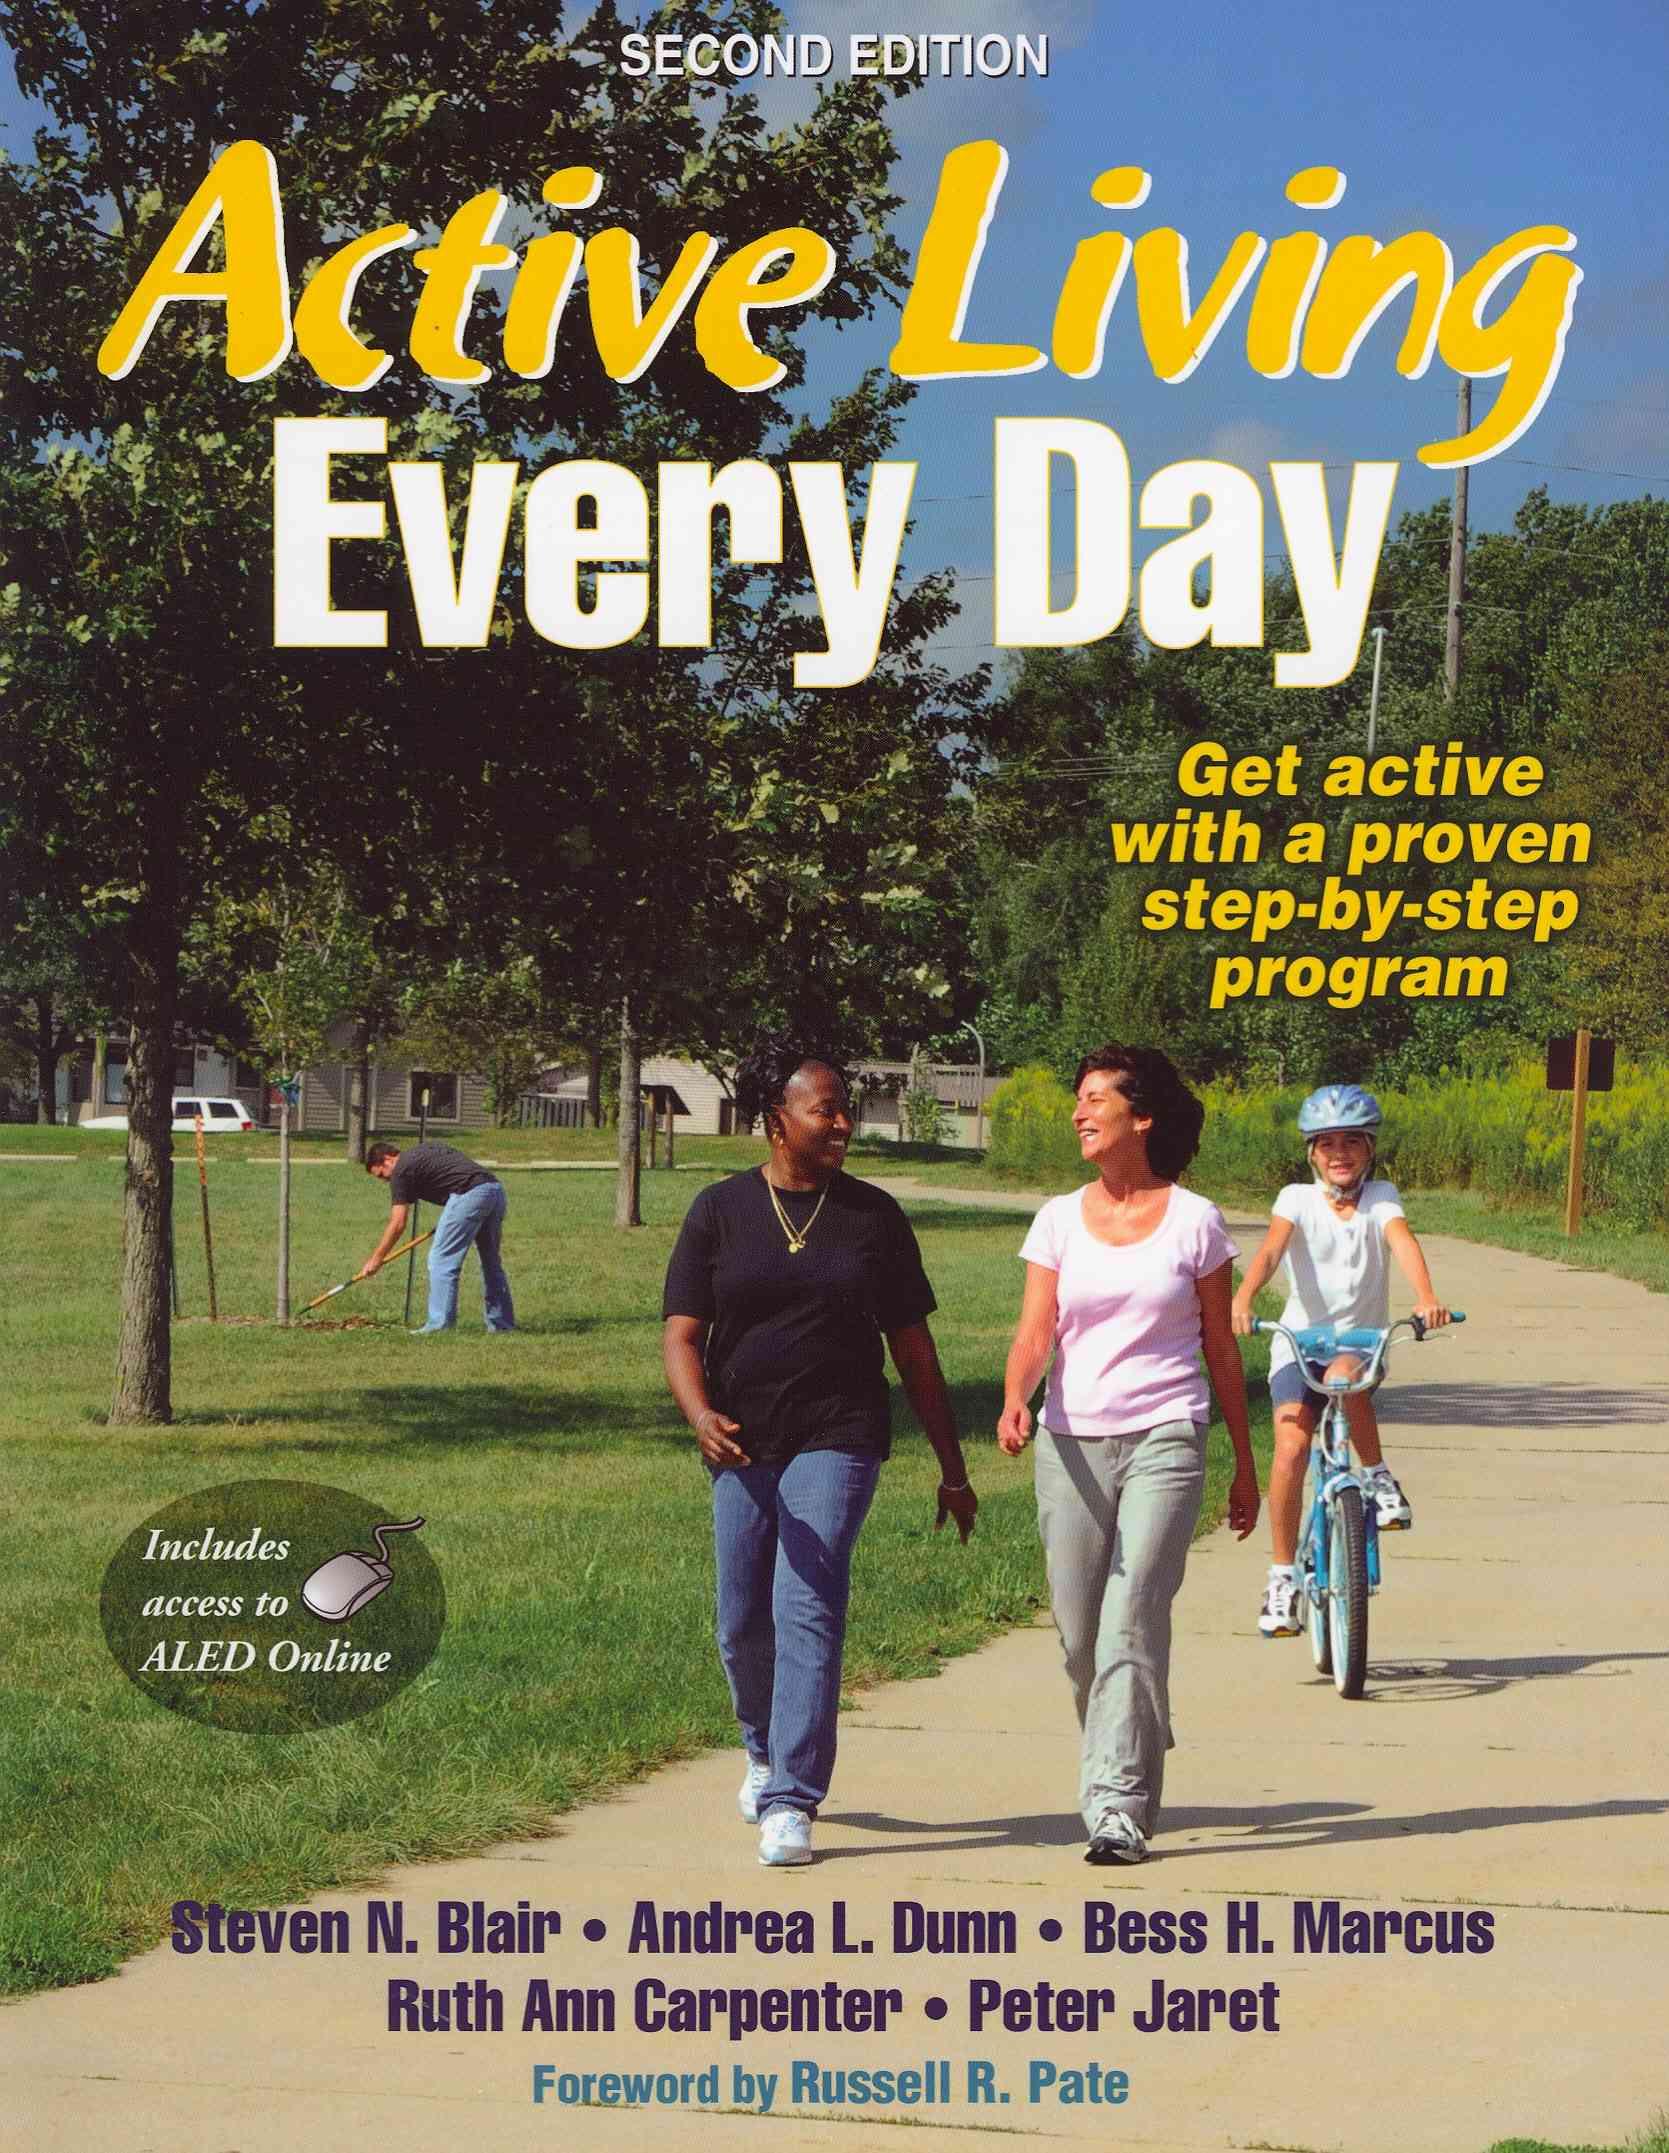 Active Living Every Day By Blair, Steven N./ Dunn, Andrea L., Ph.D./ Marcus, Bess H., Ph.D./ Carpenter, Ruth Ann/ Jaret, Peter